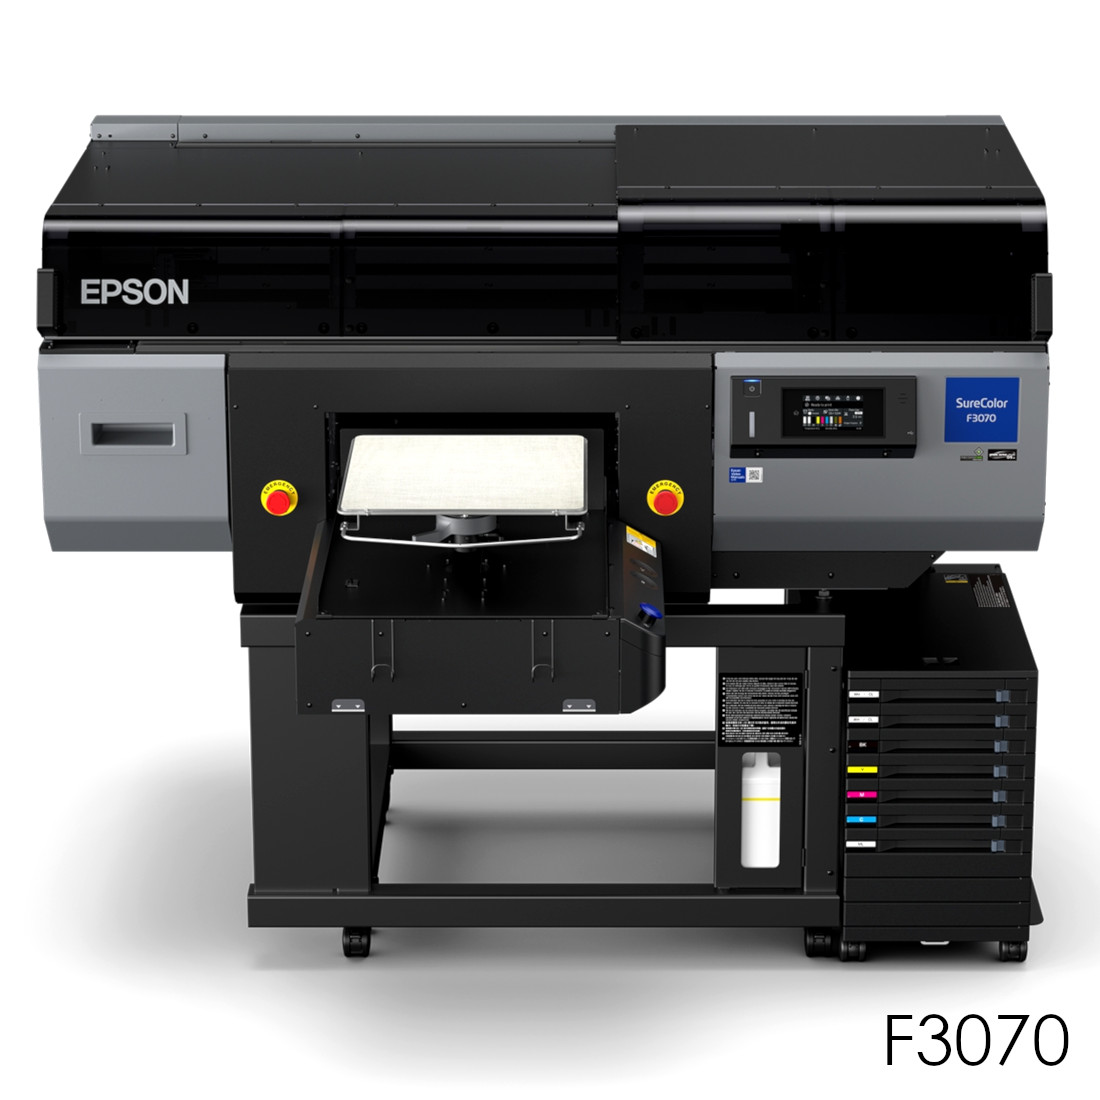 Epson F3070